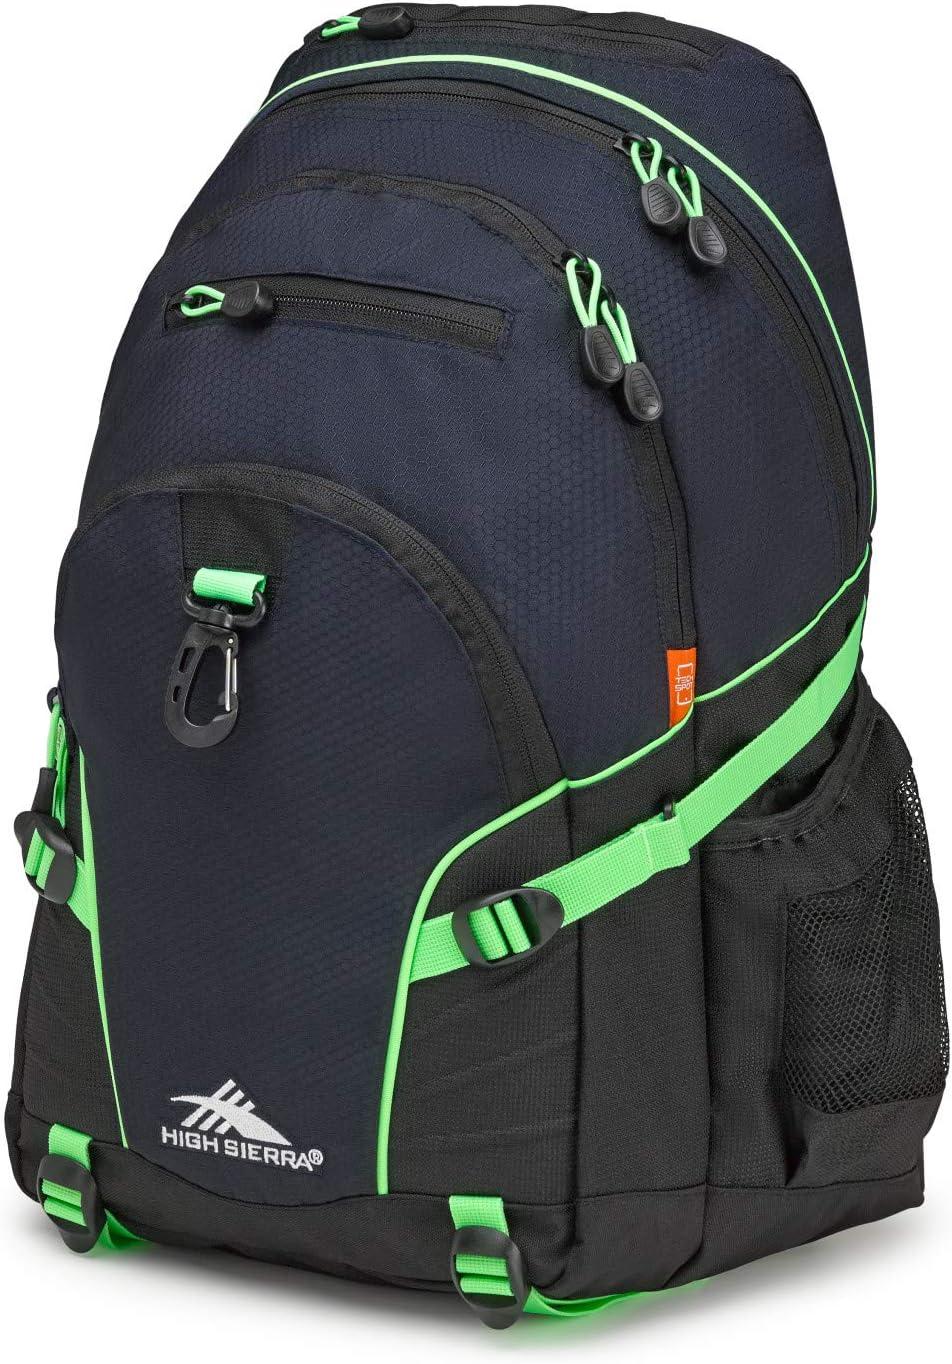 High Sierra Loop Backpack, 19 x 13.5 x 8.5-Inch, Midnight Blue/Black/Lime